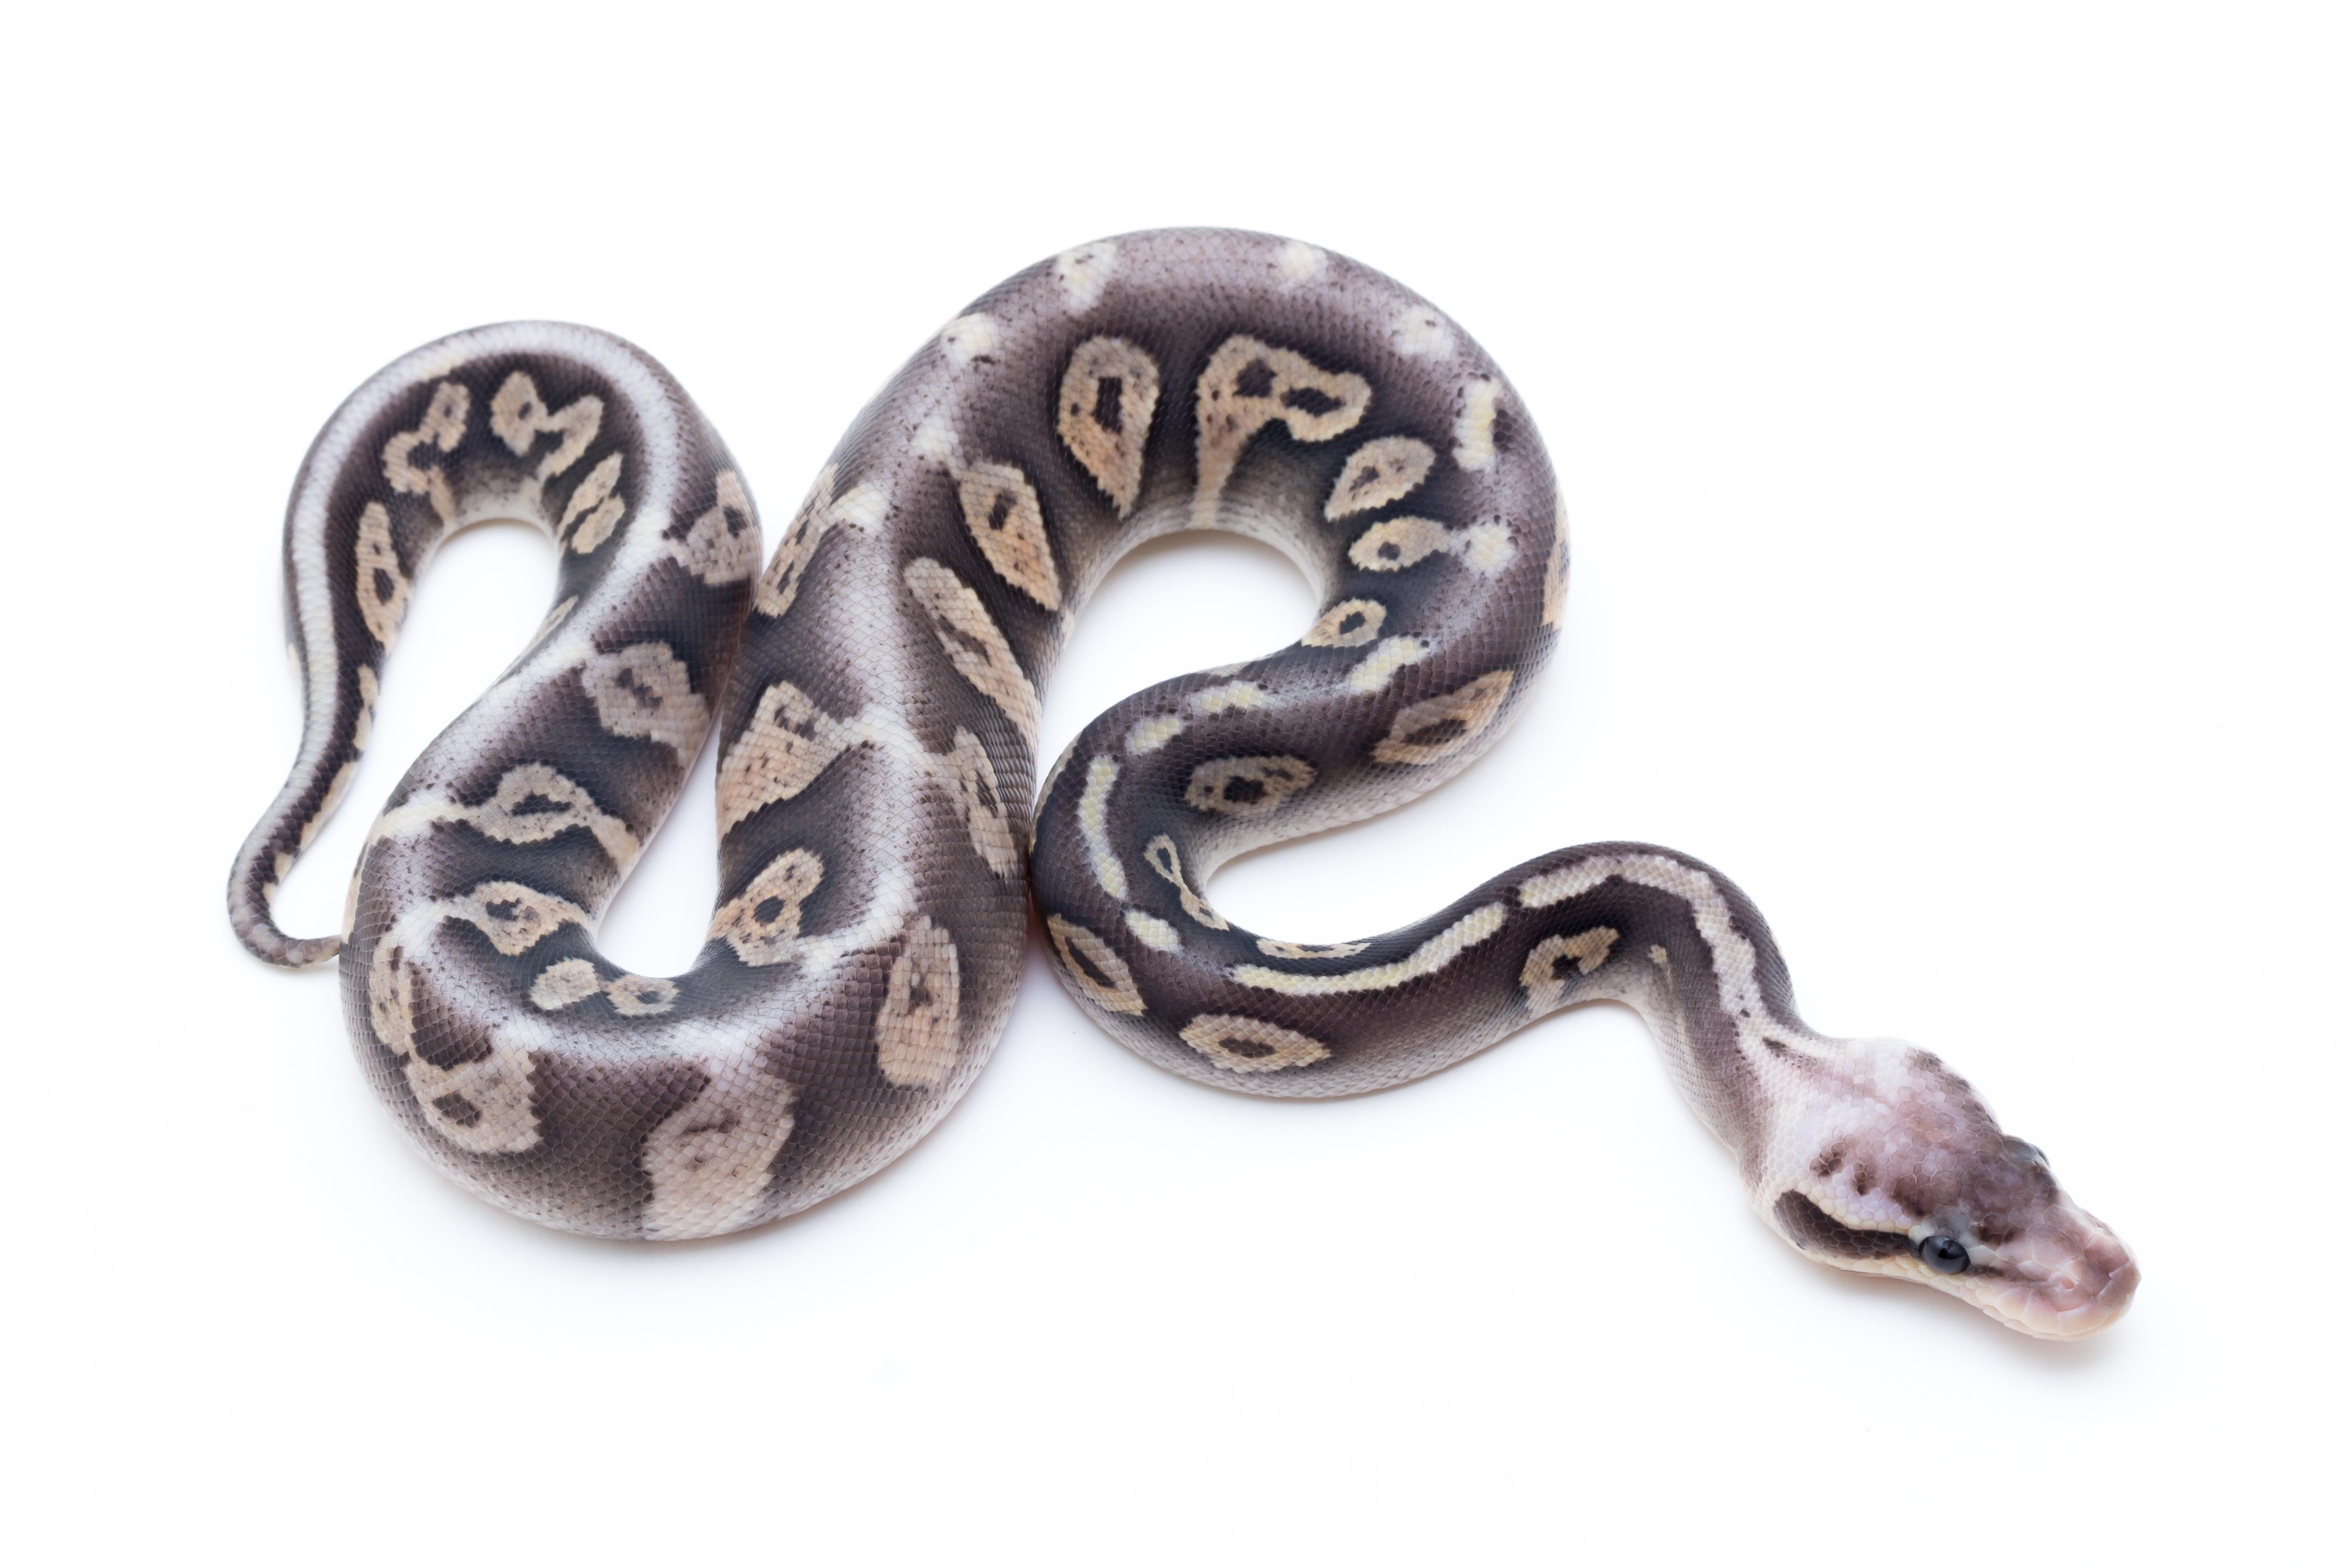 Super Pastel Fader Cinder Ball Python